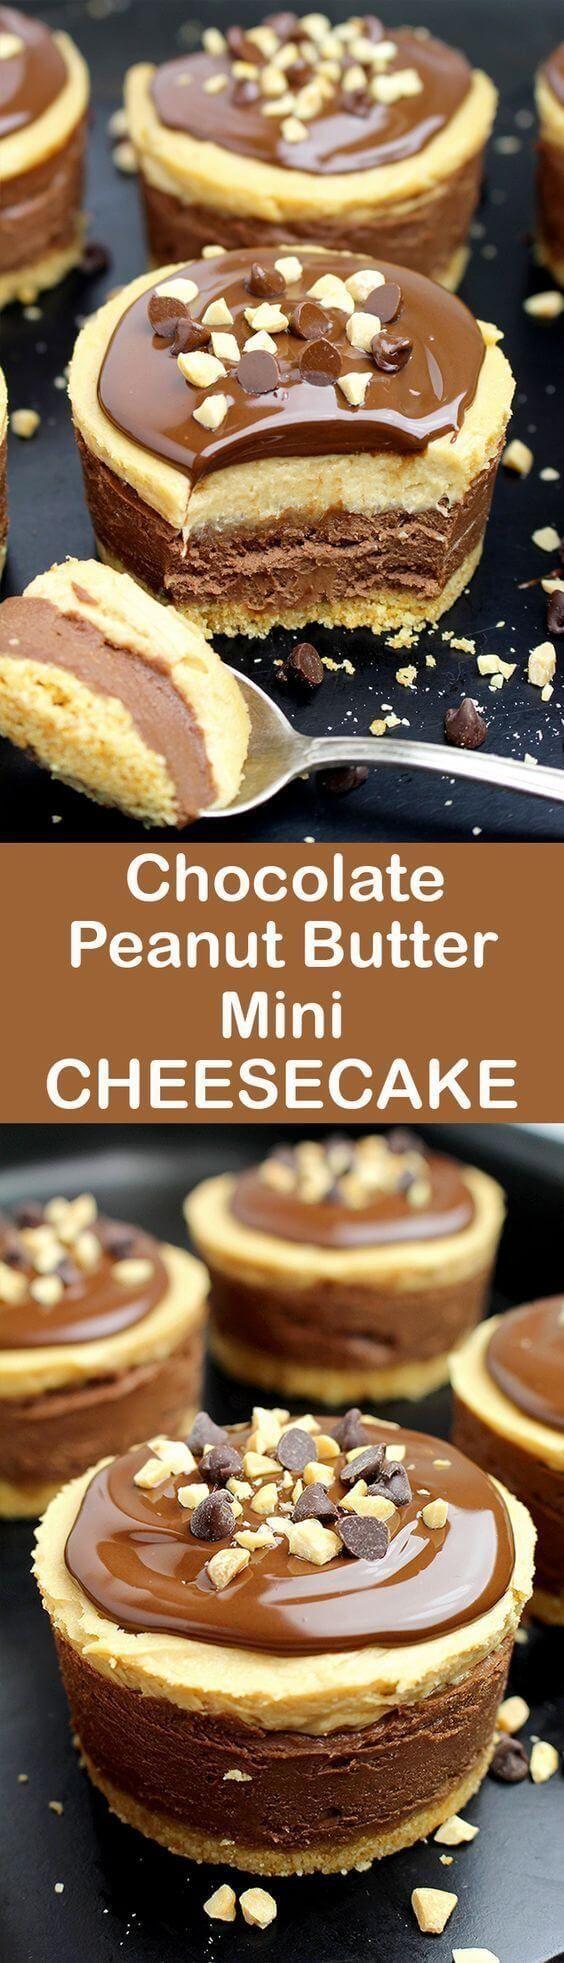 nice No-bake Chocolate Peanut Butter Mini Cheesecake